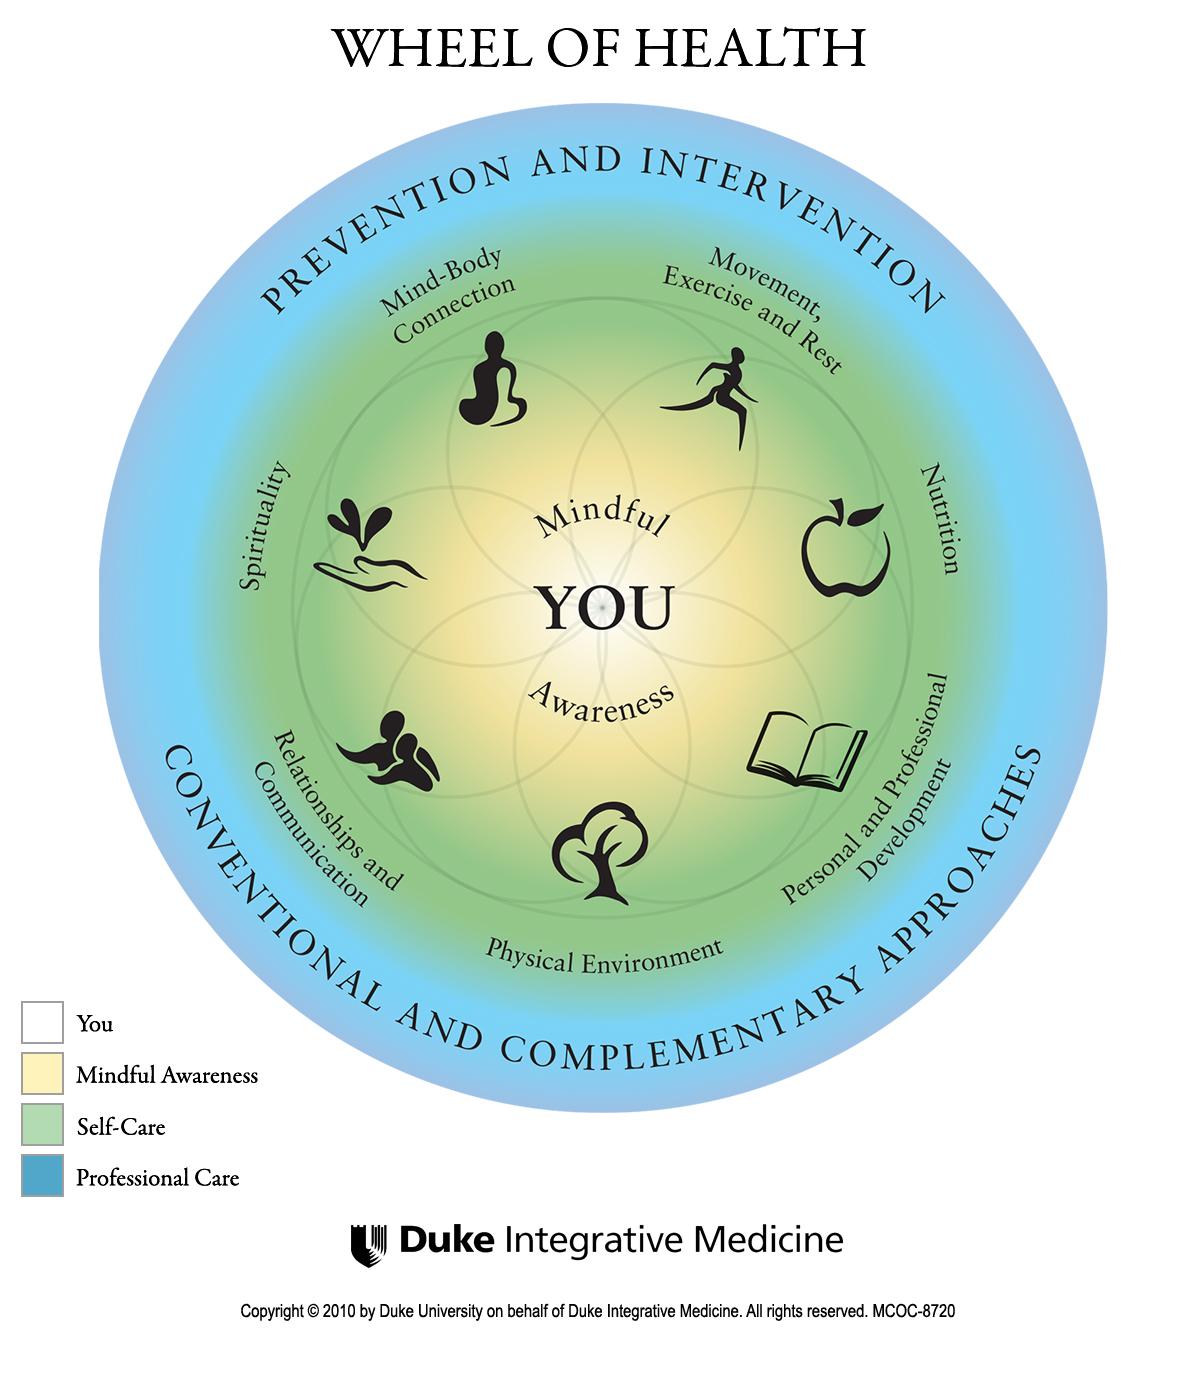 Wheel of Health.png